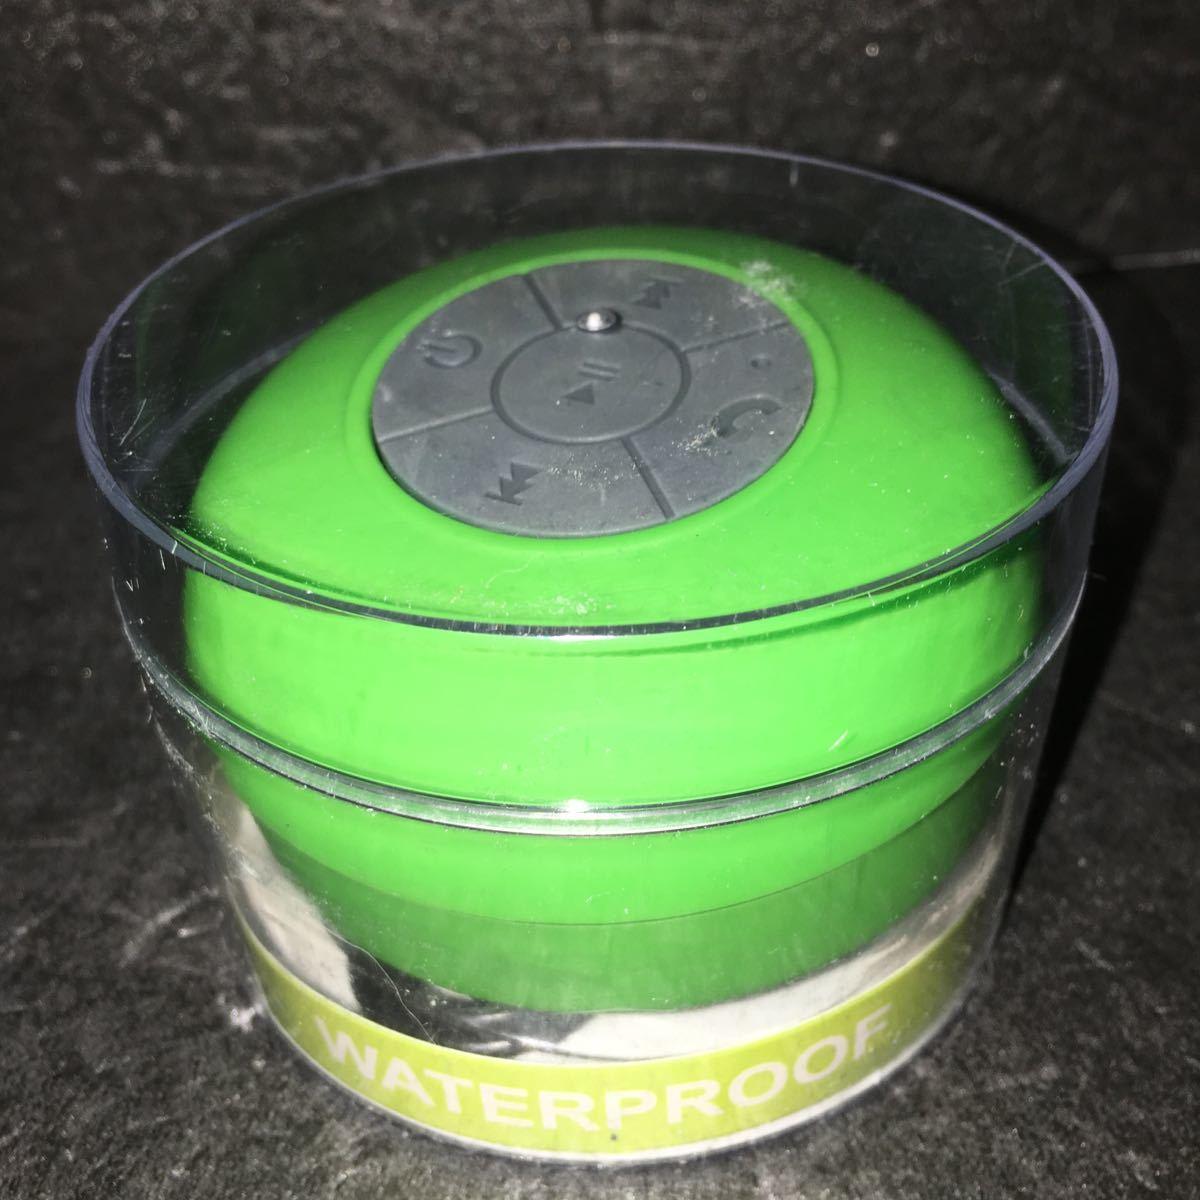 Waterproof Wireless Bluetooth Speaker Shower Handsfree Built-in MIC Player 防水ブルートゥーススピーカー 緑_画像1